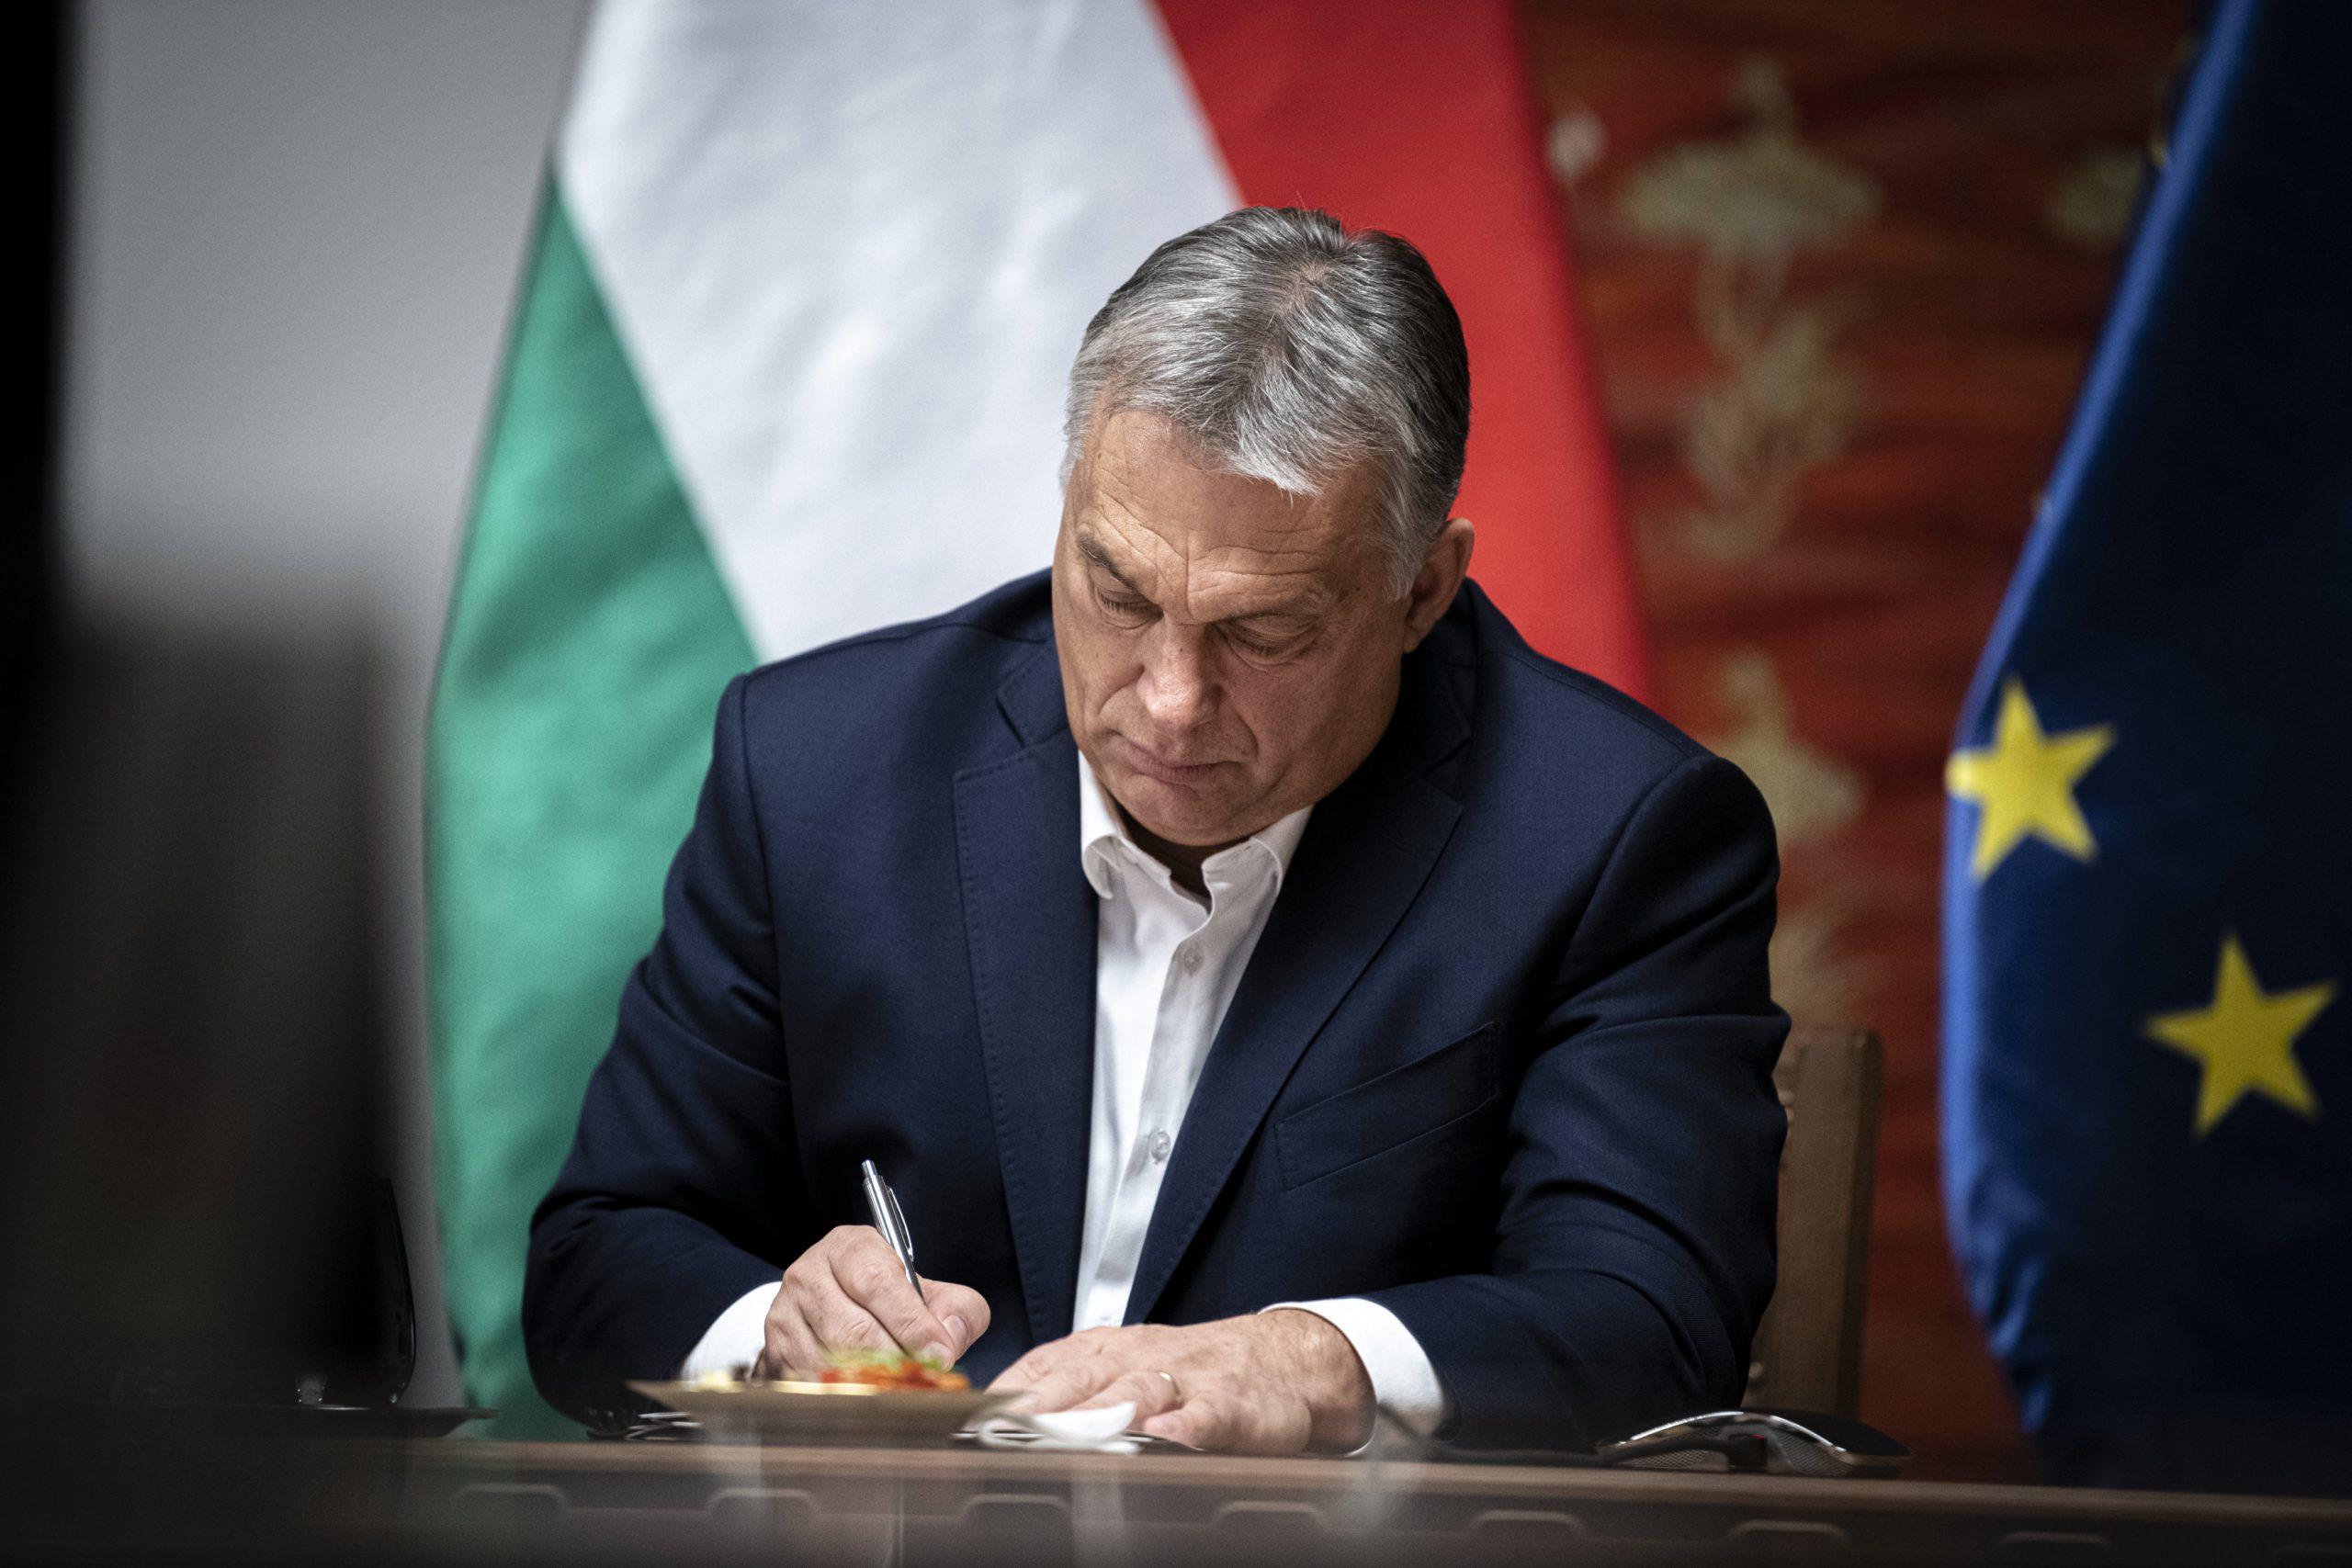 Hungarian Press Roundup: EU Reaches Budget and Stimulus Deal